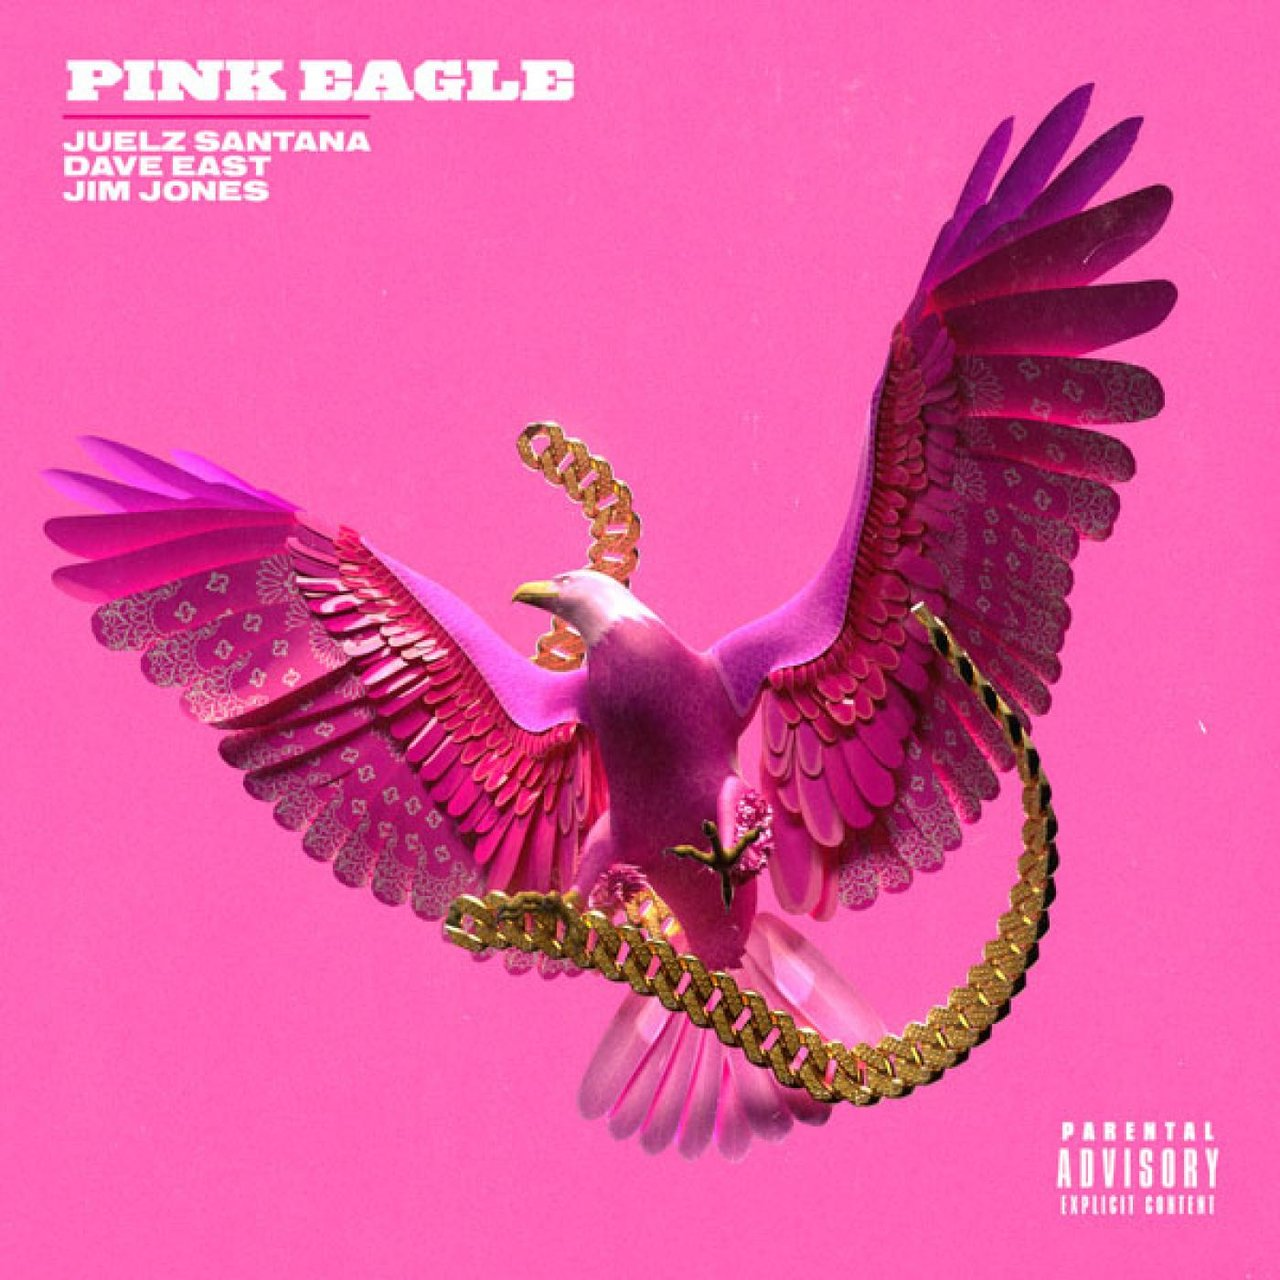 Juelz Santana - Pink Eagle (ft. Jim Jones & Dave East)